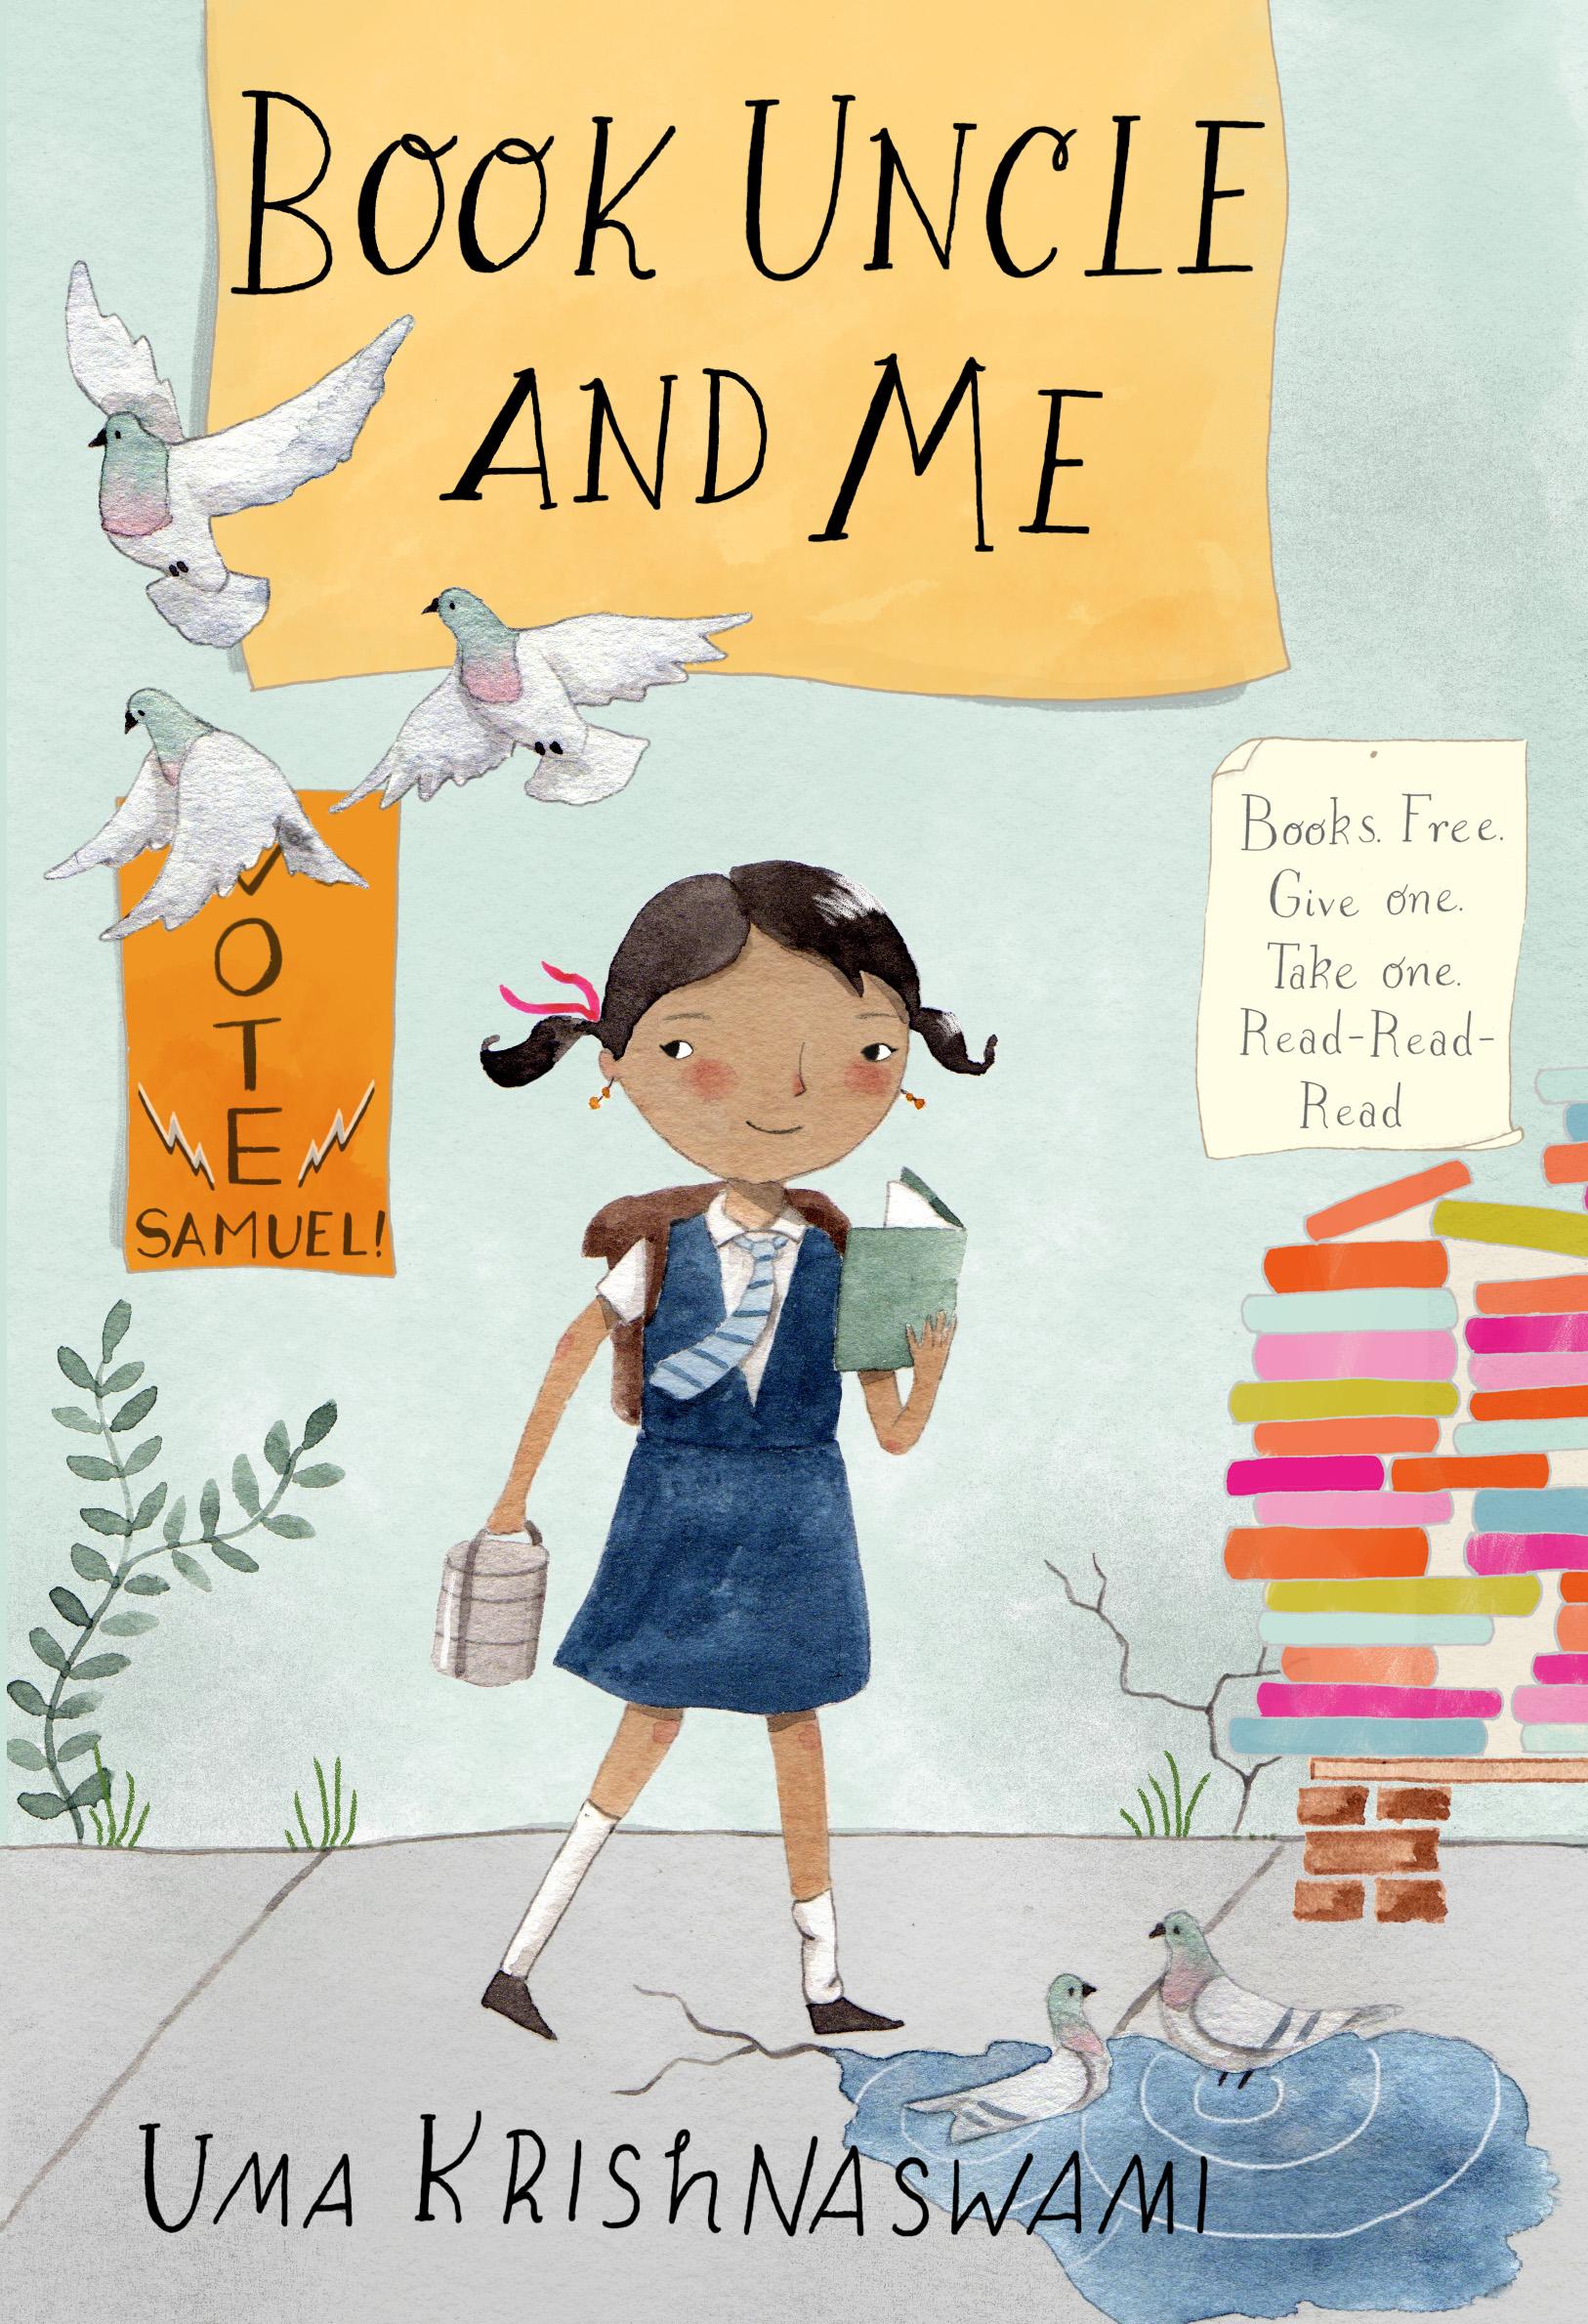 Book Uncle and Me, by Uma Krishnaswami